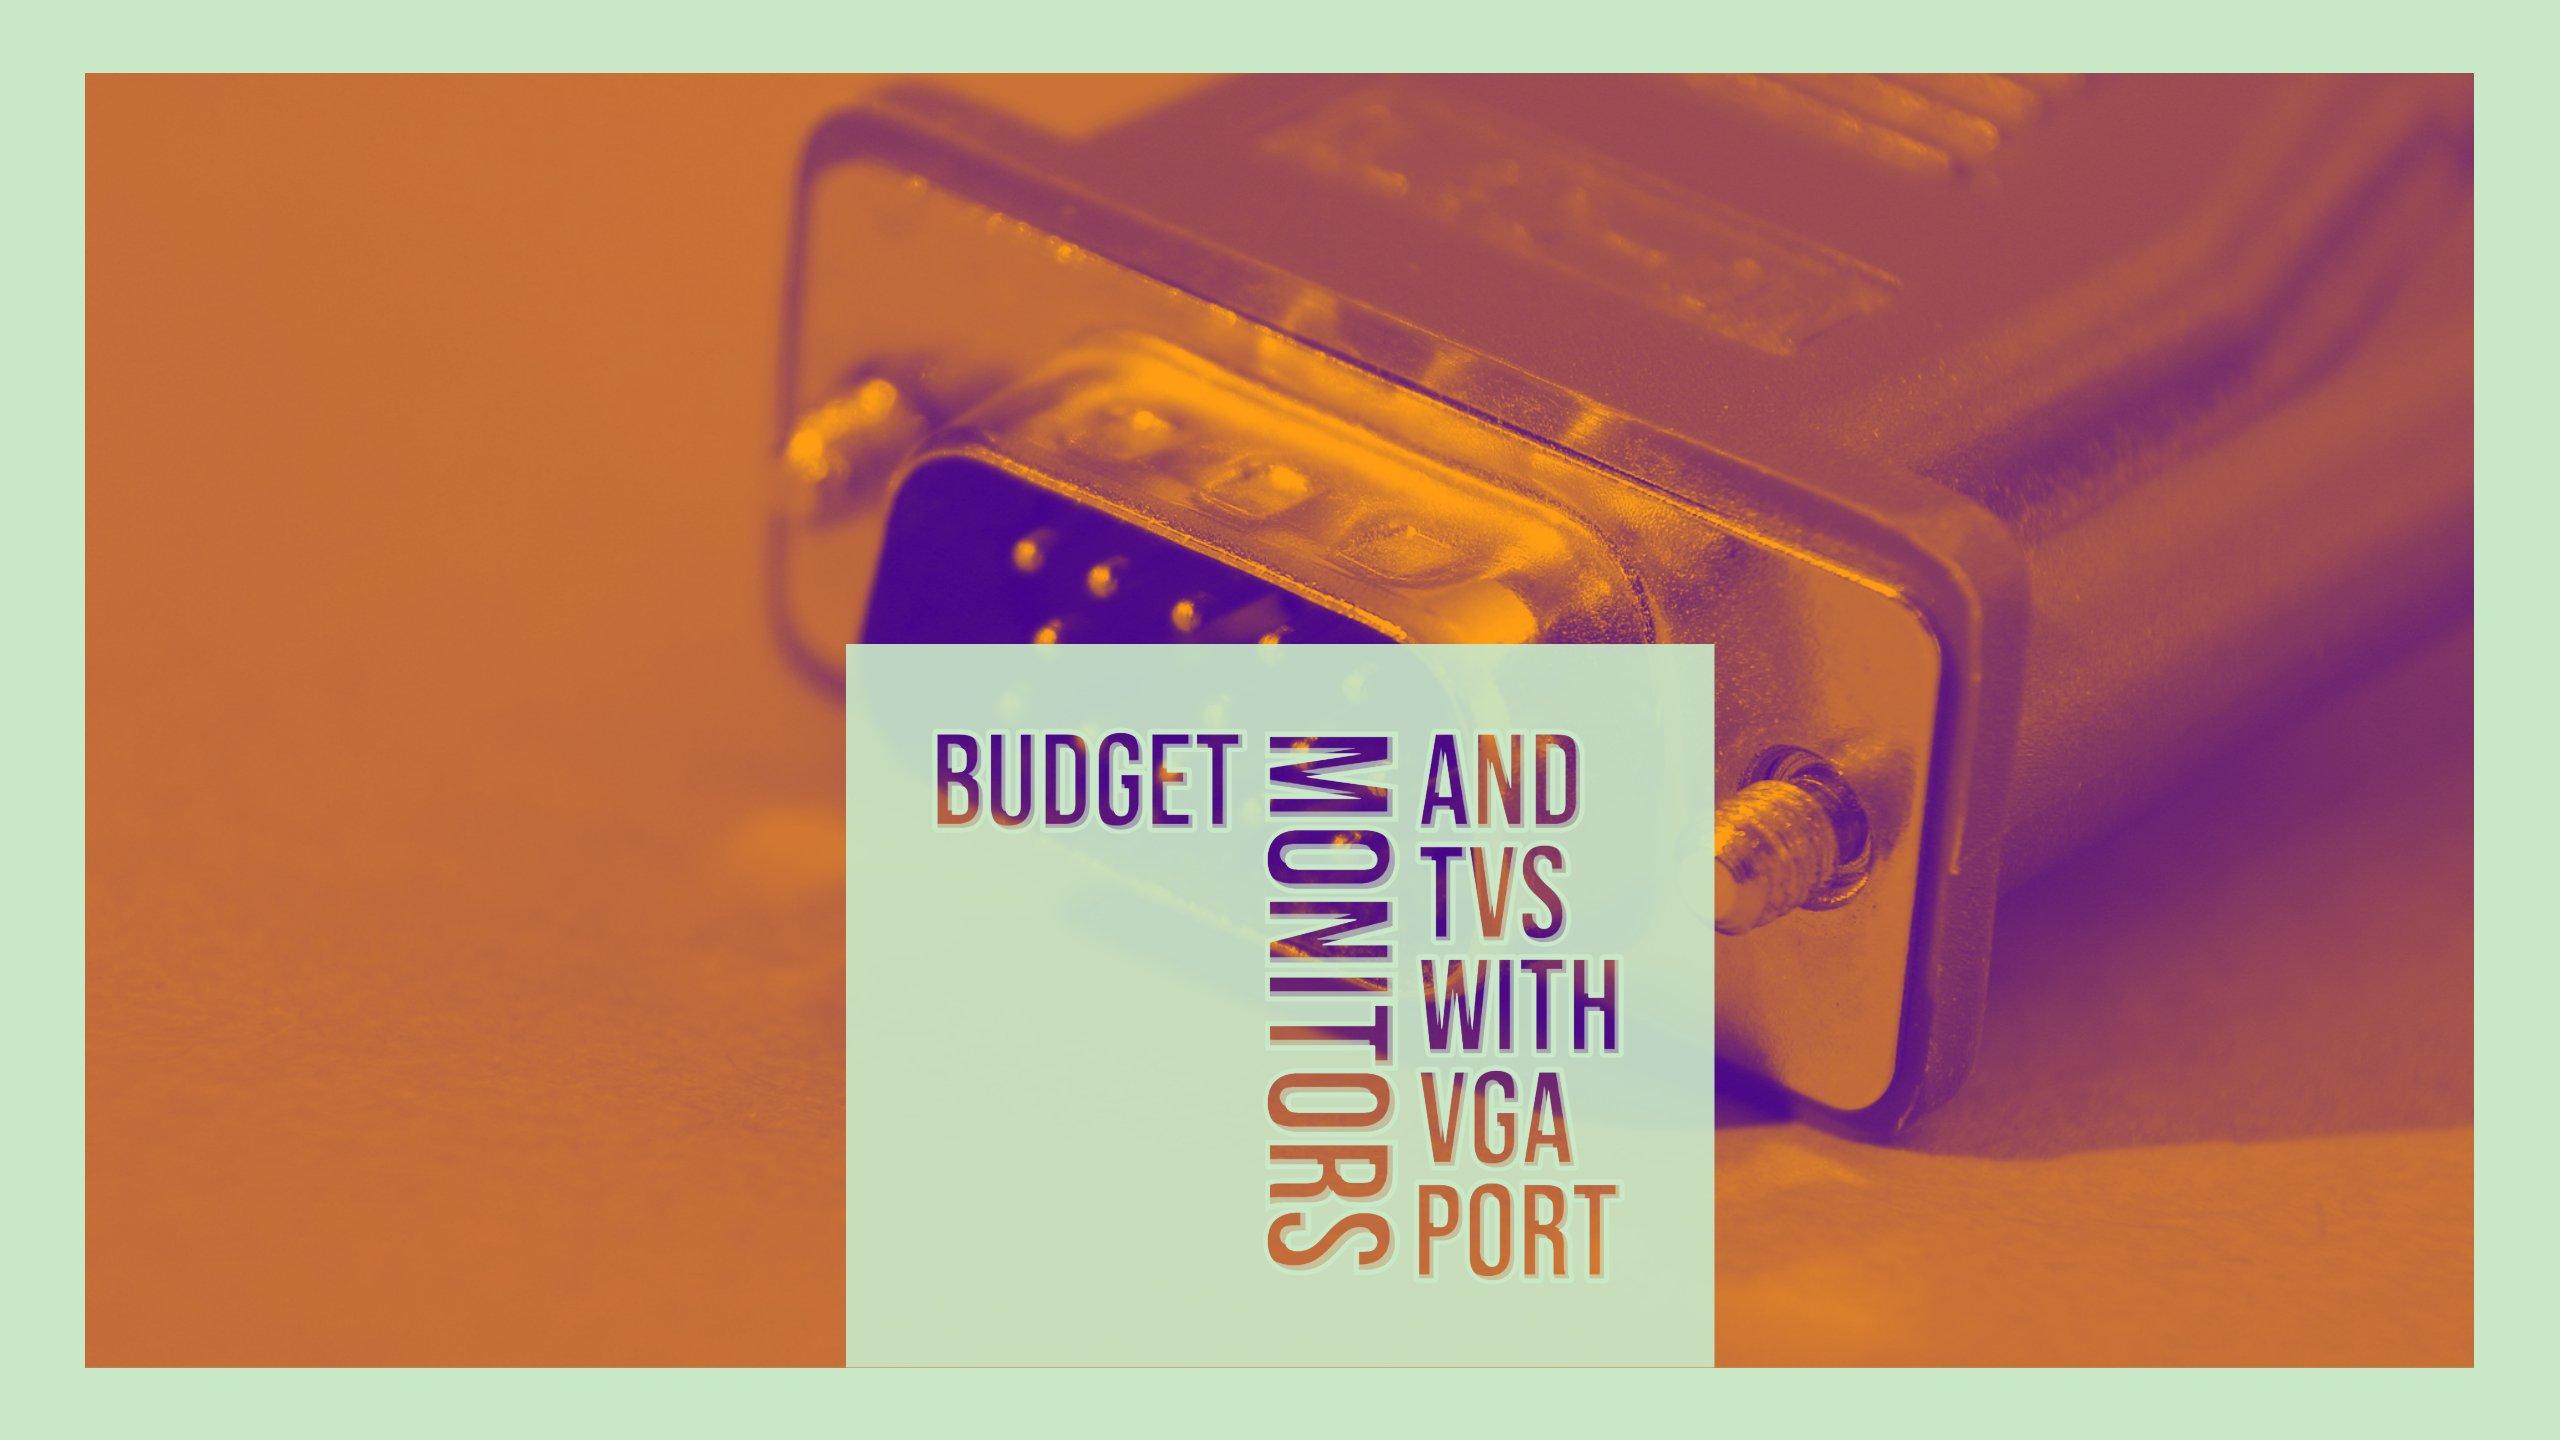 Budget Monitors and TVs with VGA port